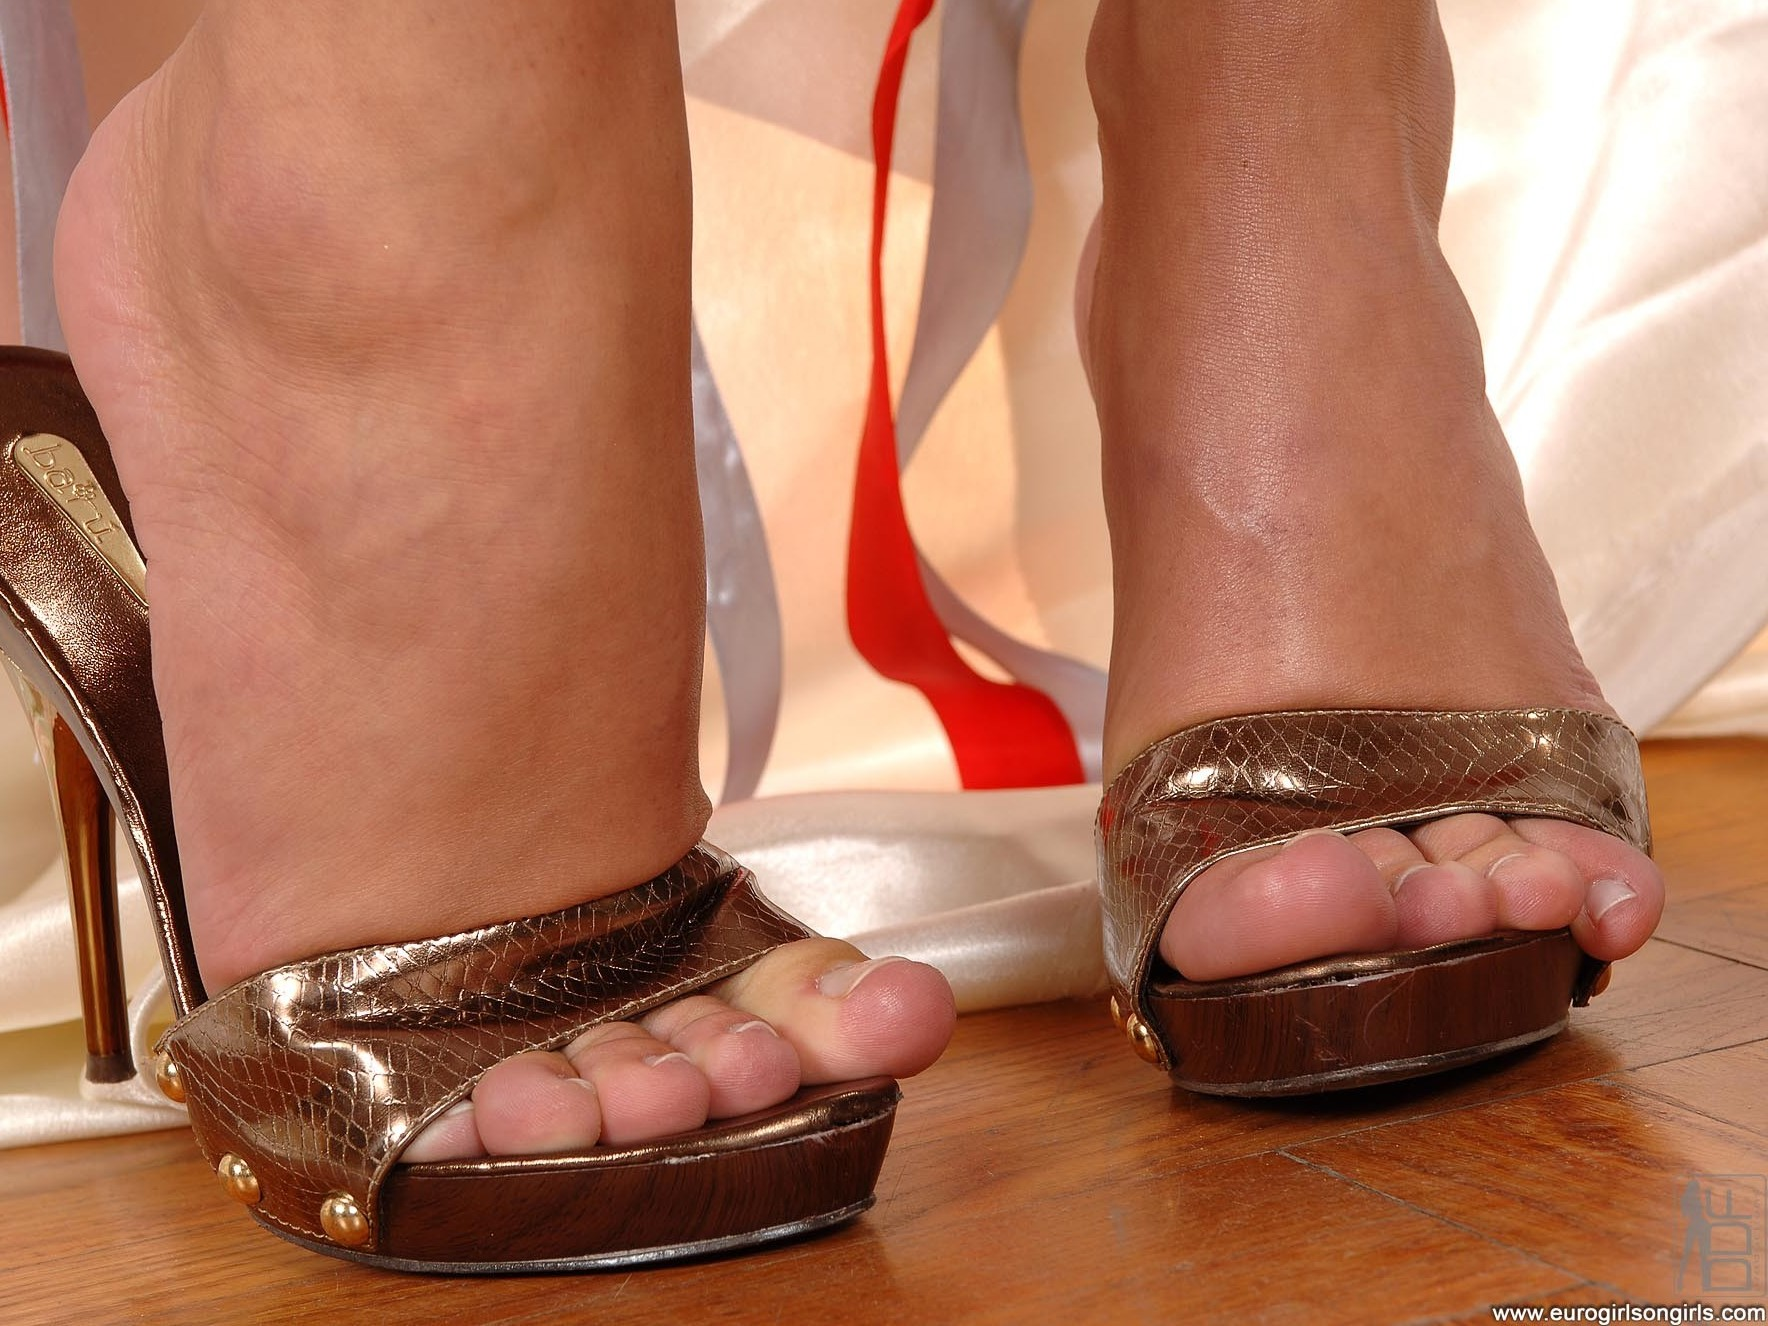 Mya diamond foot